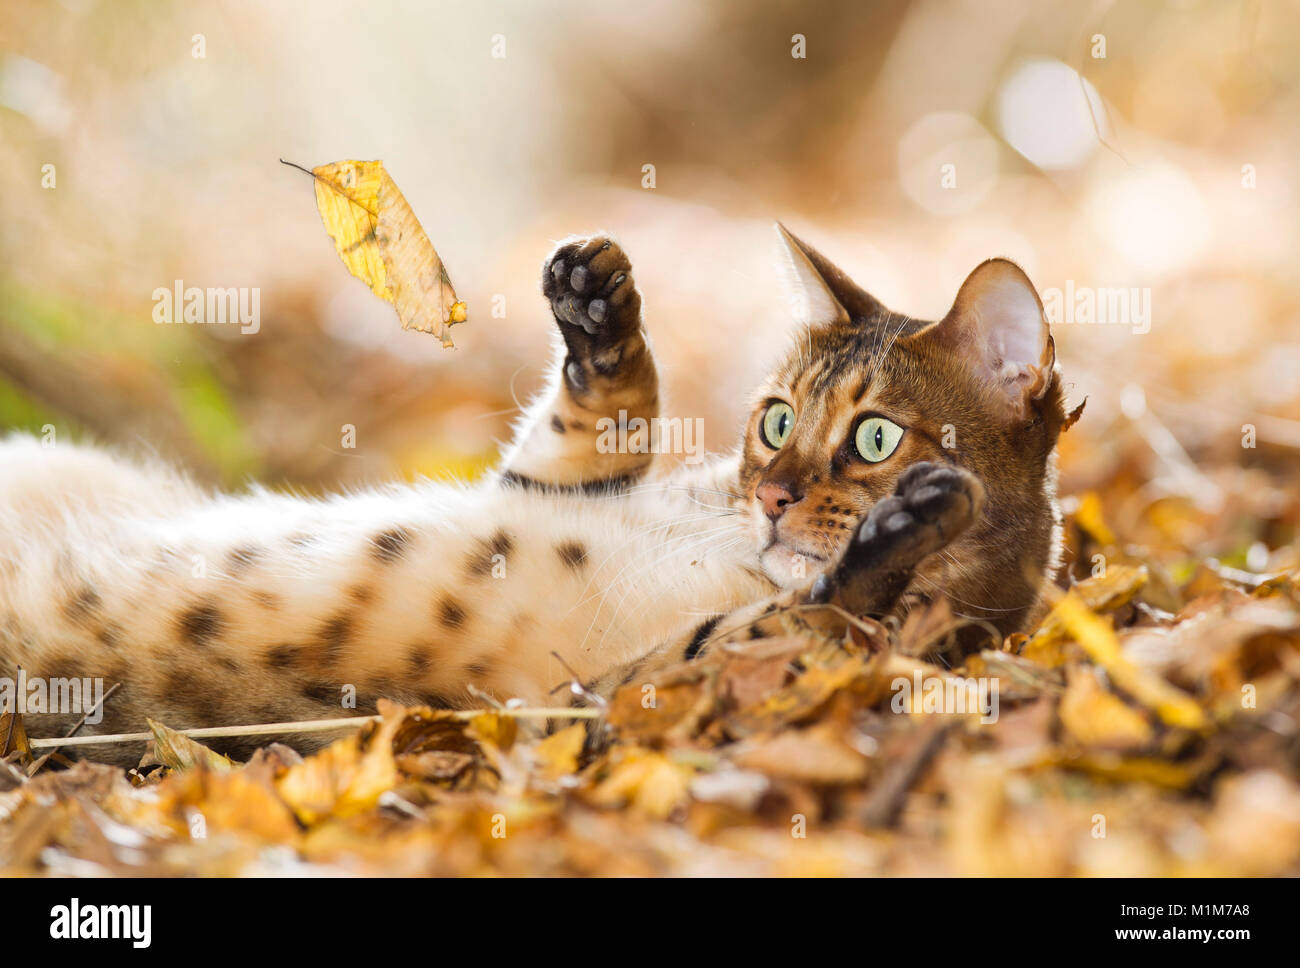 Bengala gato tumbado en la hojarasca, jugando con la caída de la hoja. Alemania Foto de stock